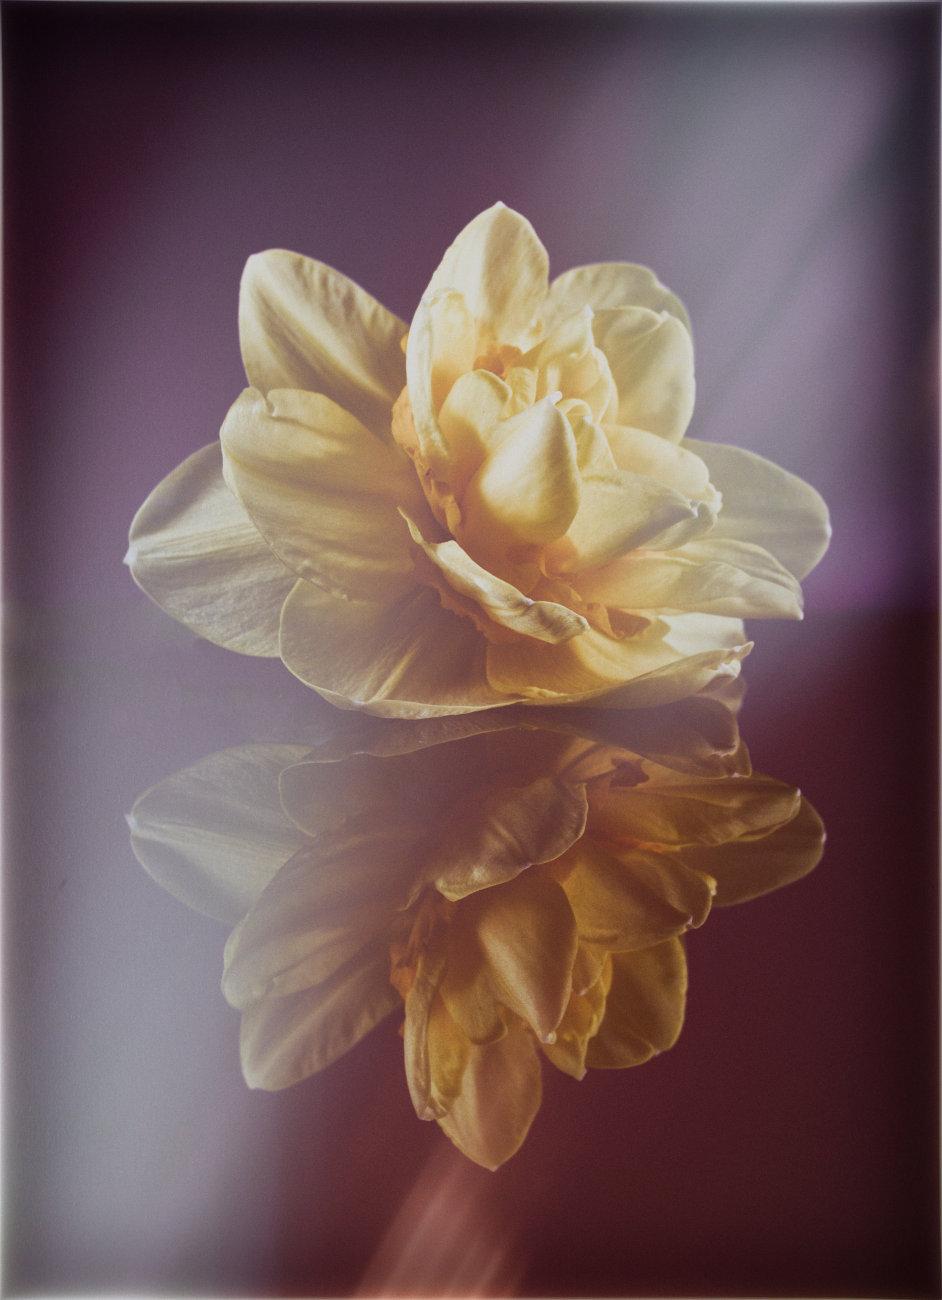 Daffodils with a twist